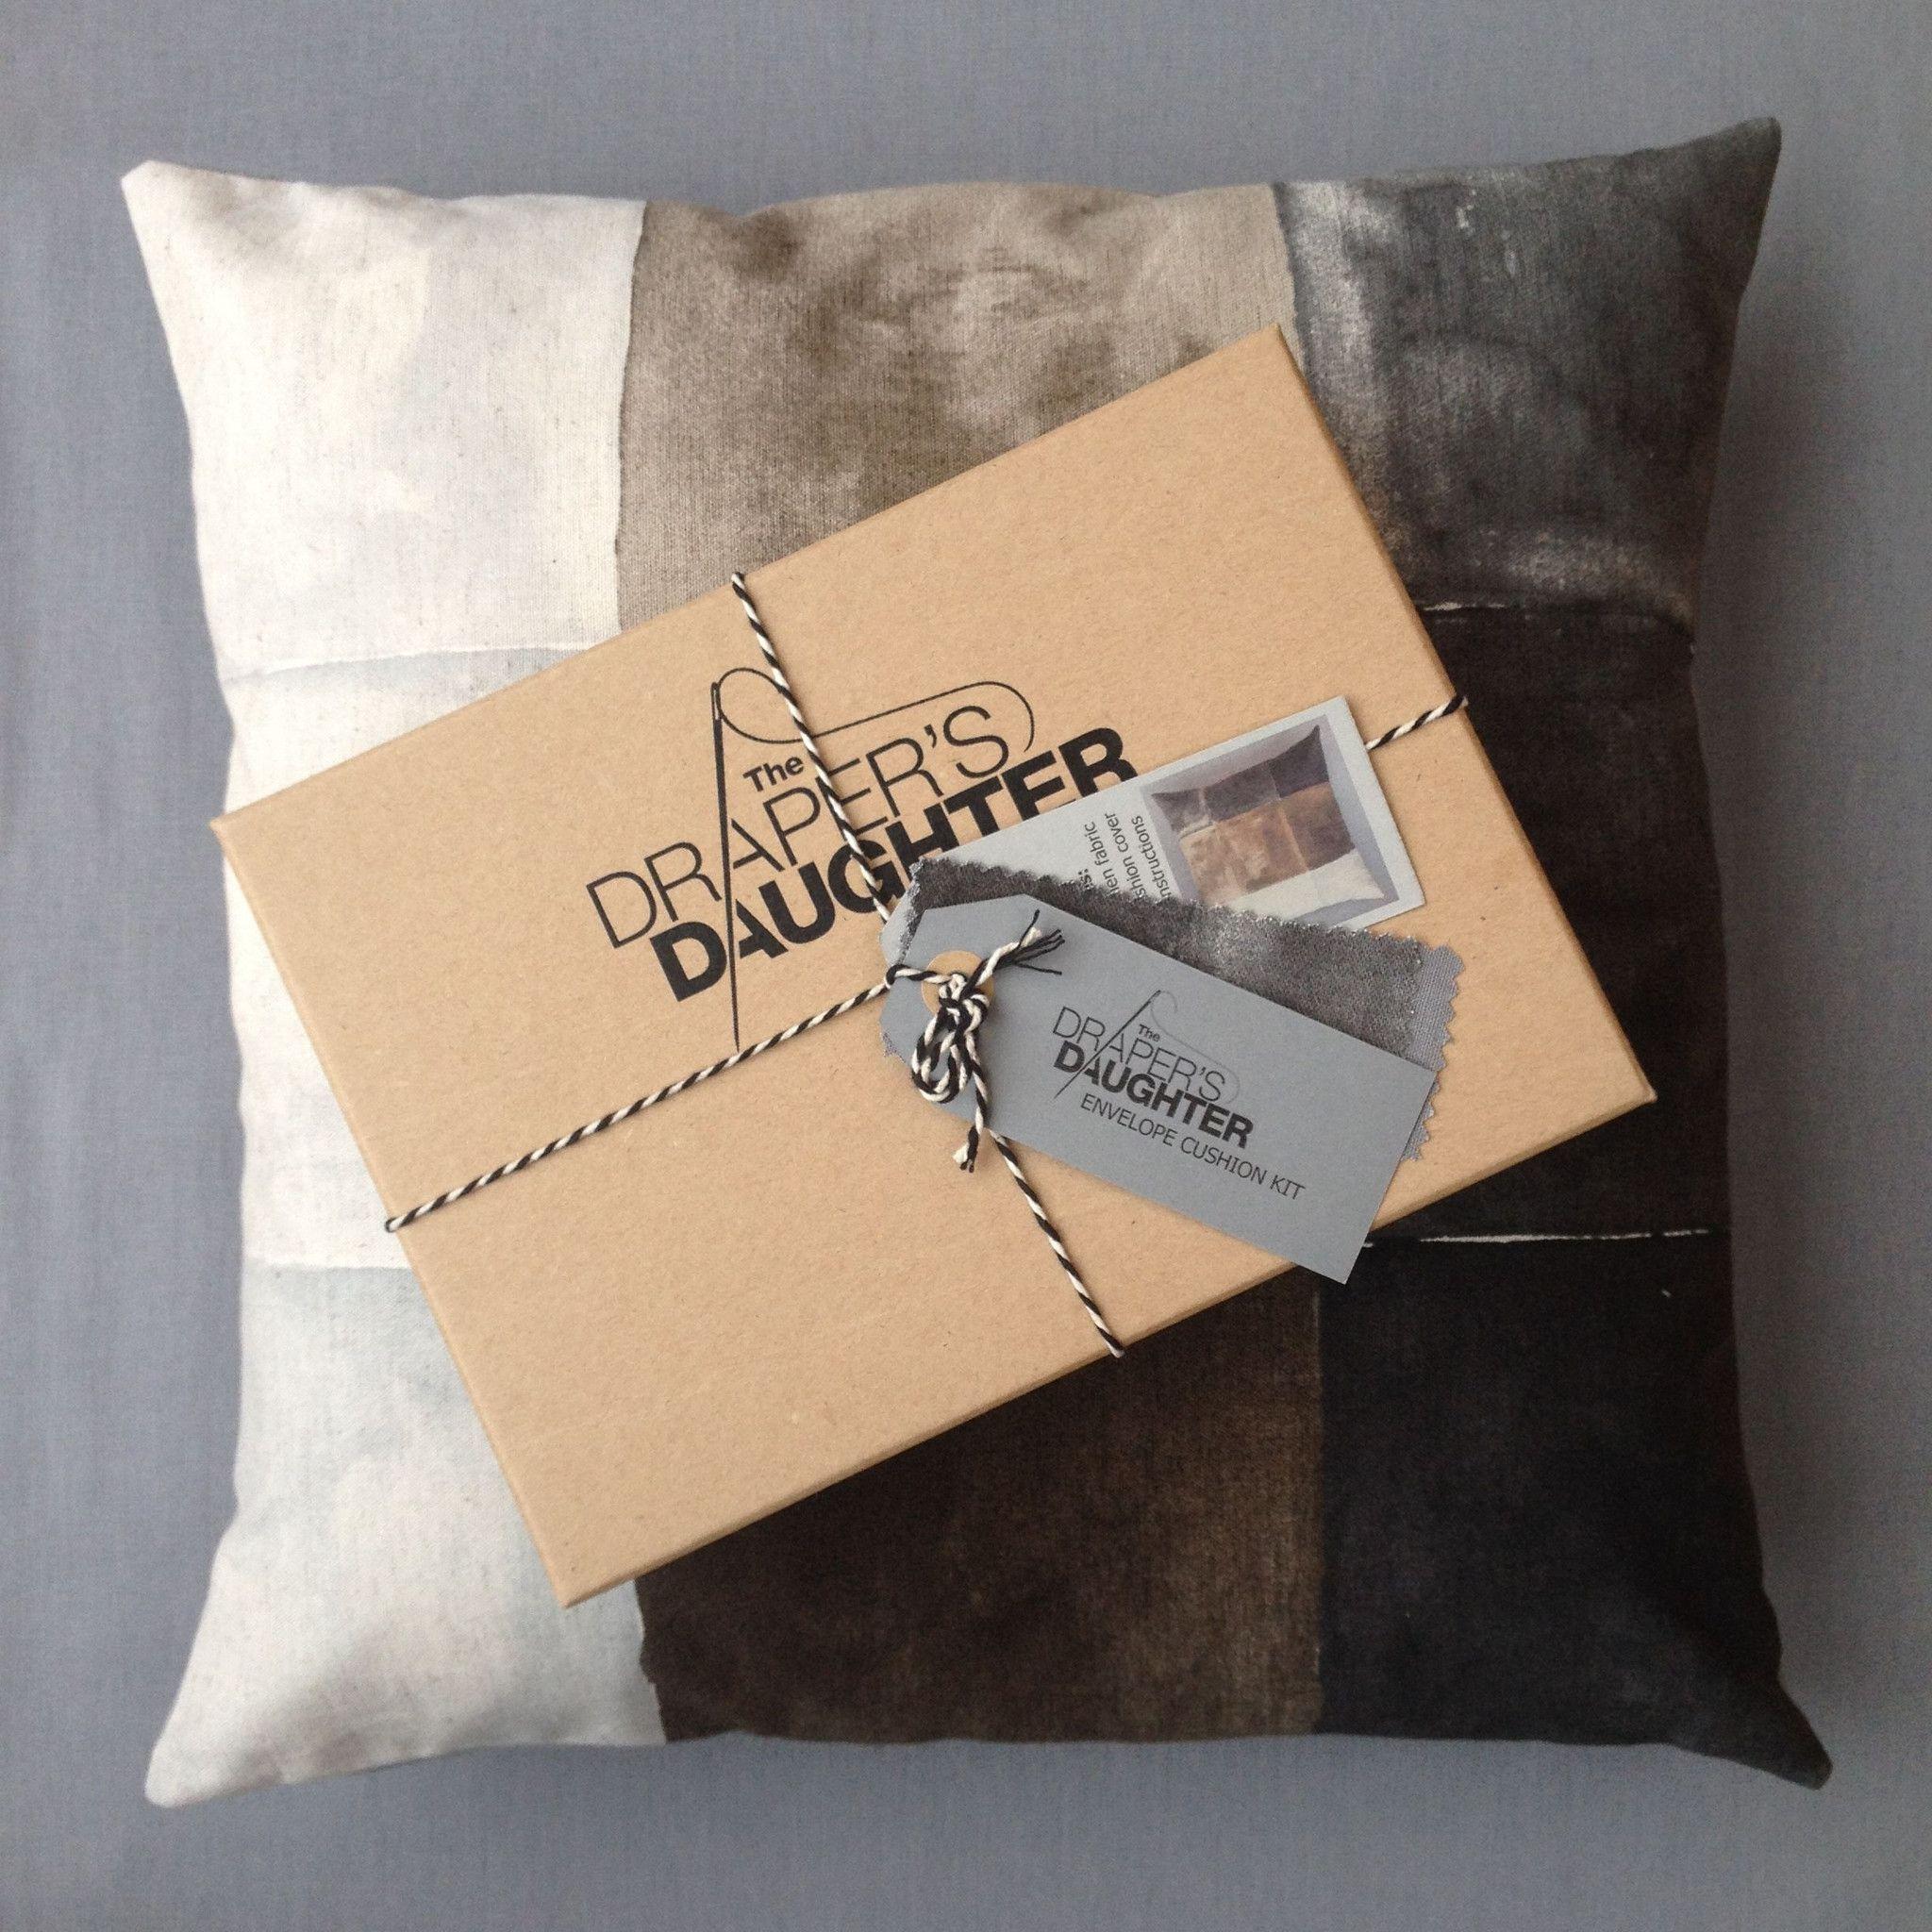 The draperus daughter cushion cover kit in nani iro for kokkaus